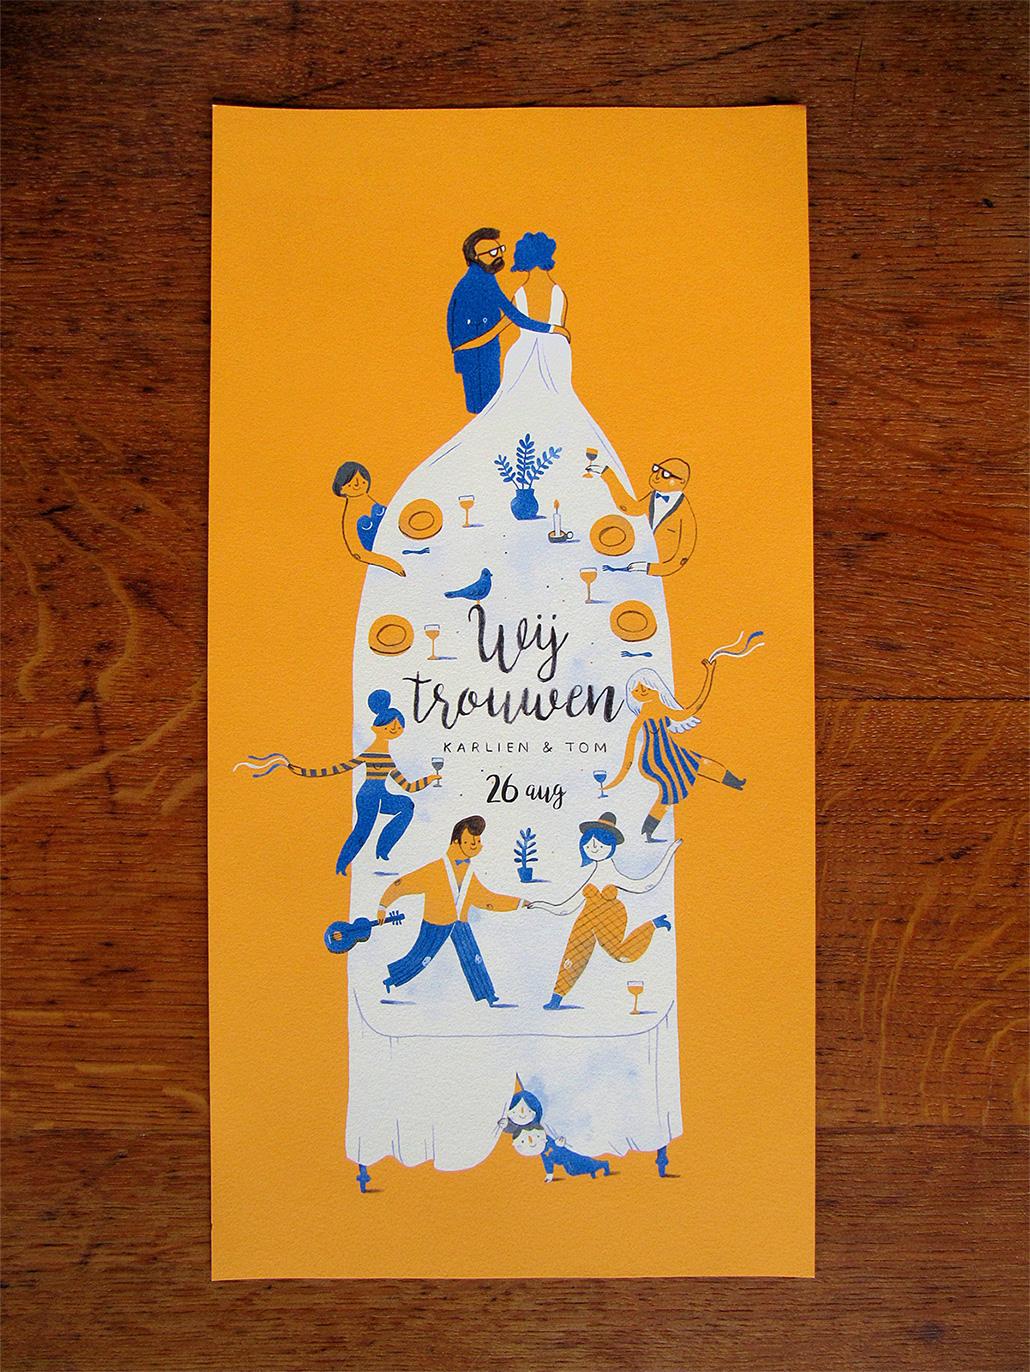 Wedding invitation tom karlien on behance stopboris Choice Image